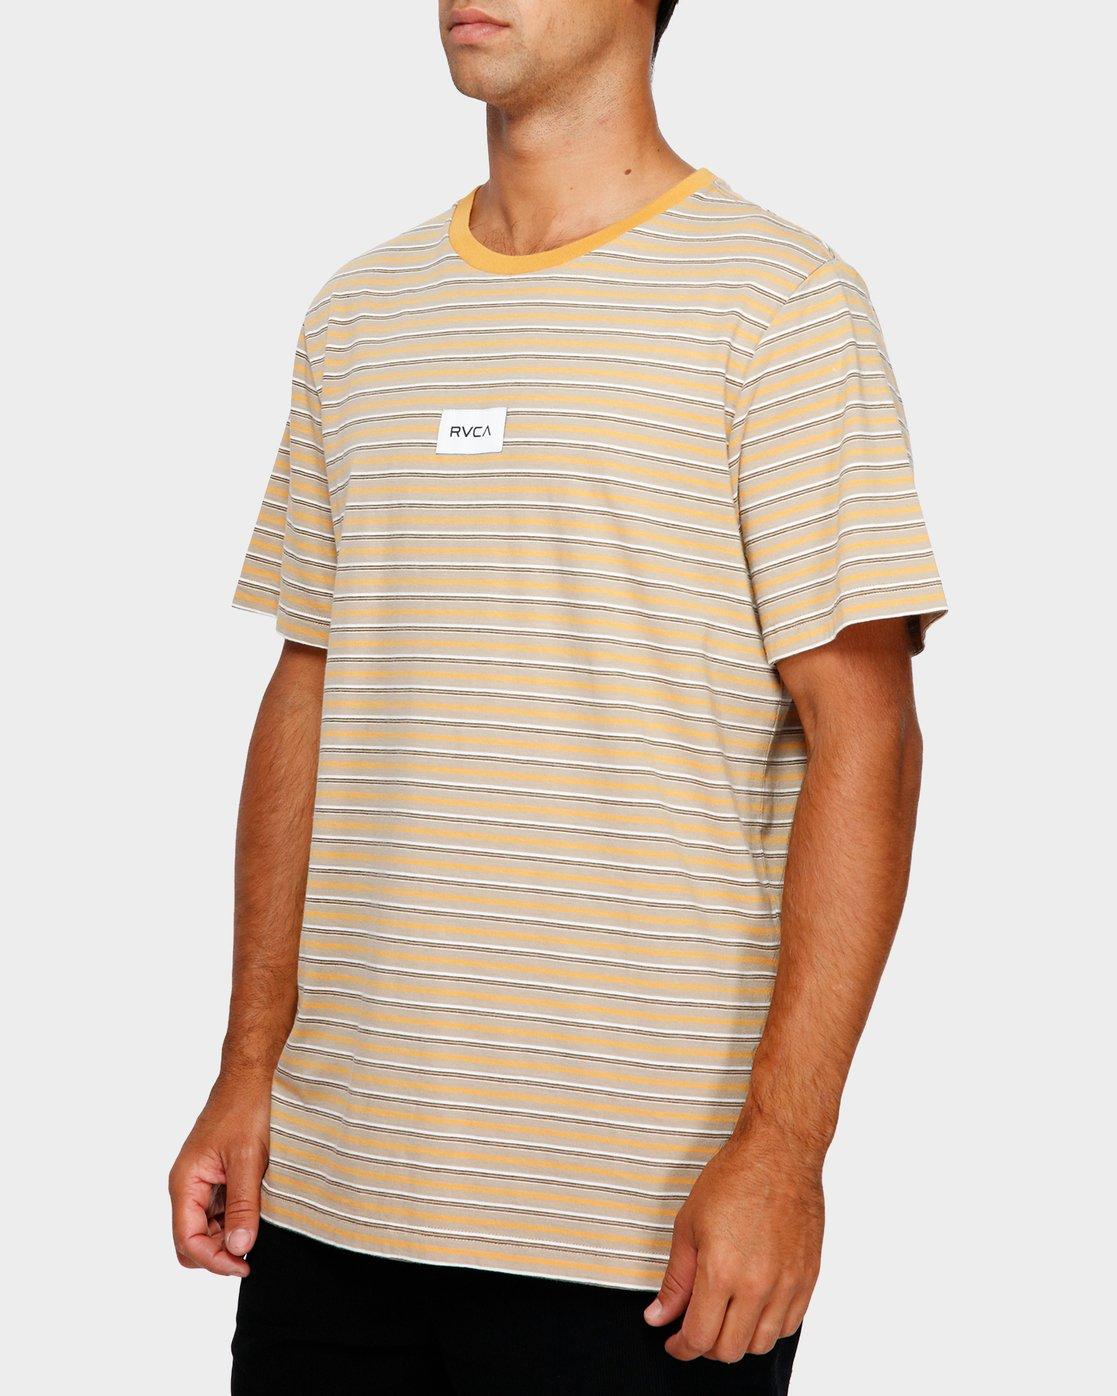 2 RVCA Focus Stripe T-Shirt Yellow R191049 RVCA